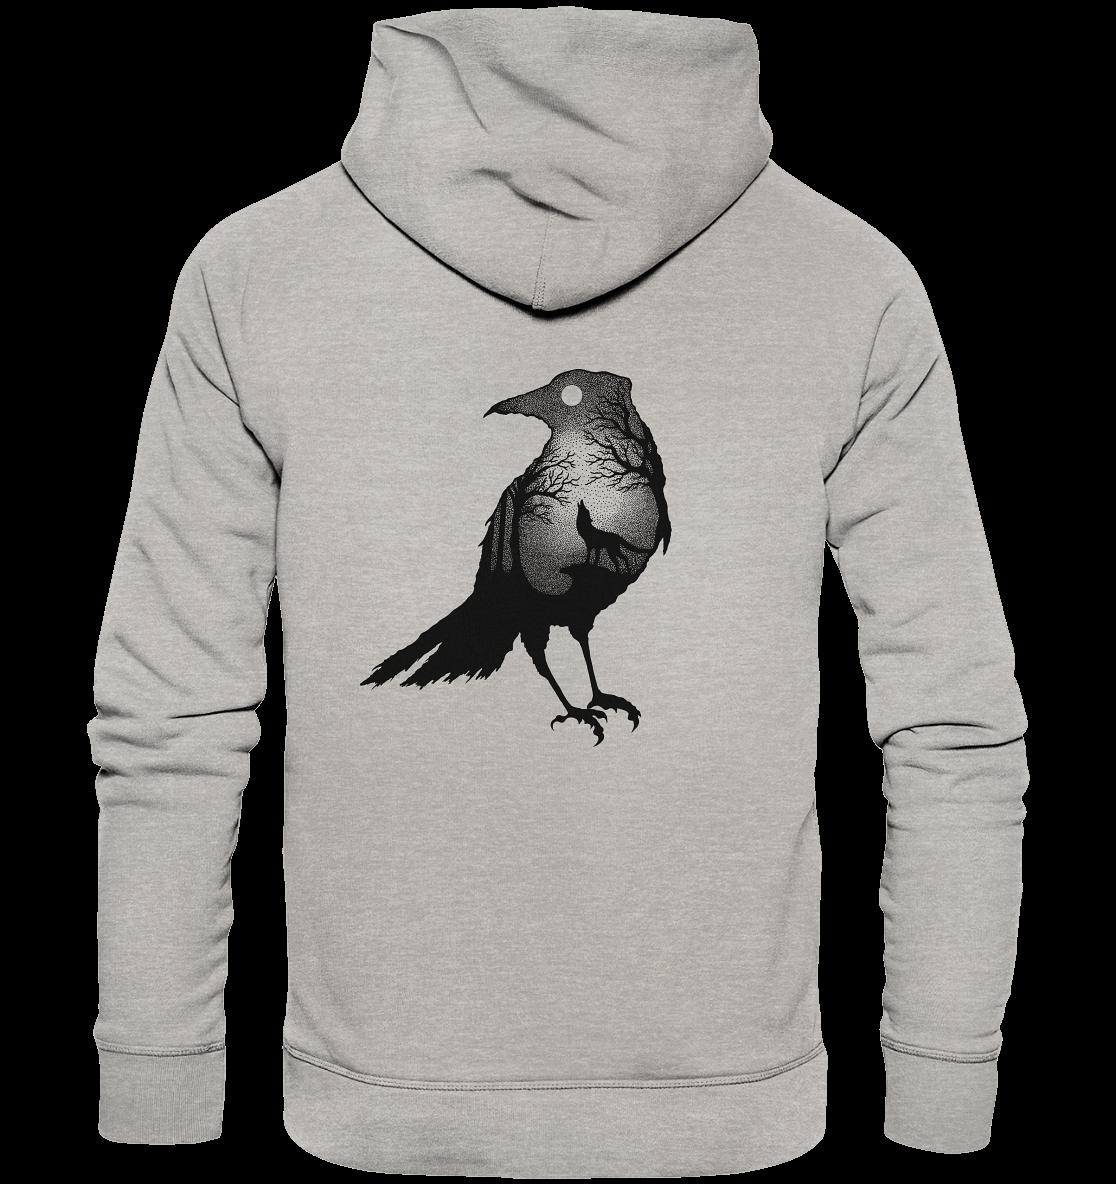 back-organic-hoodie-c2c1c0-1116x-2.png